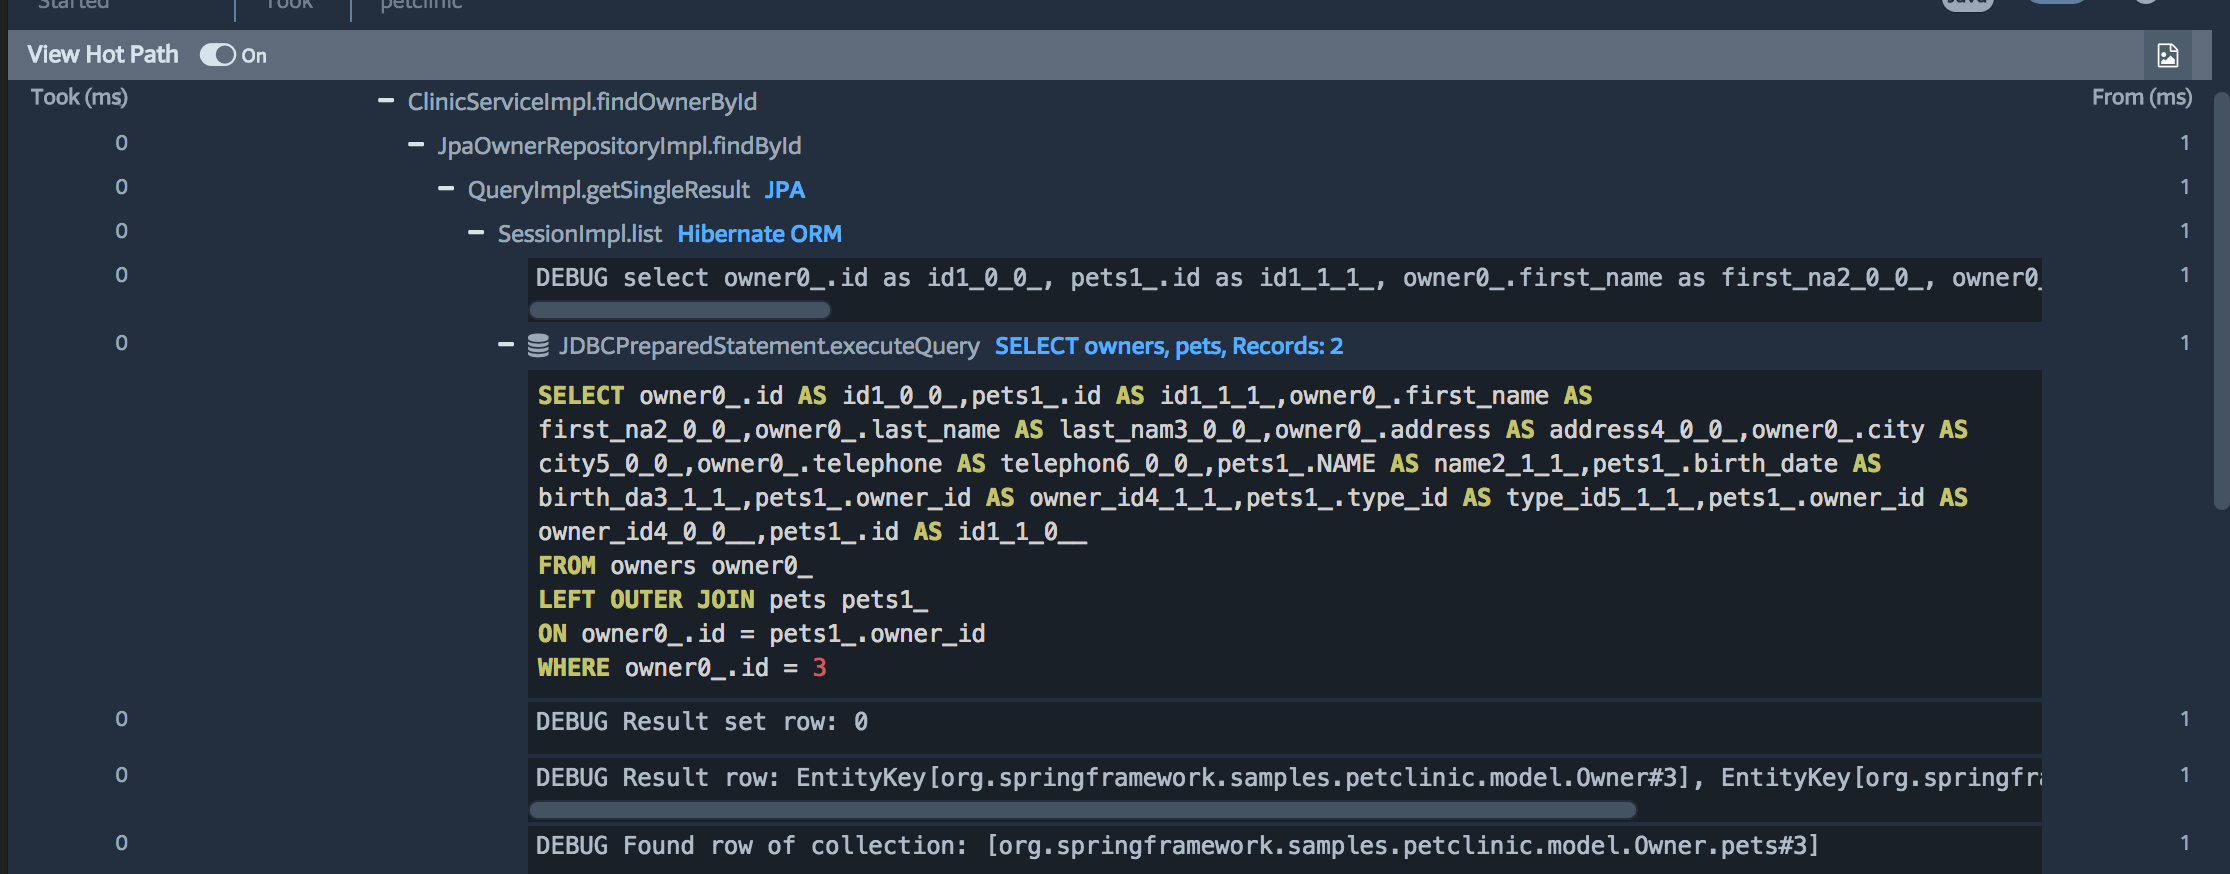 Prefix web request performance trace